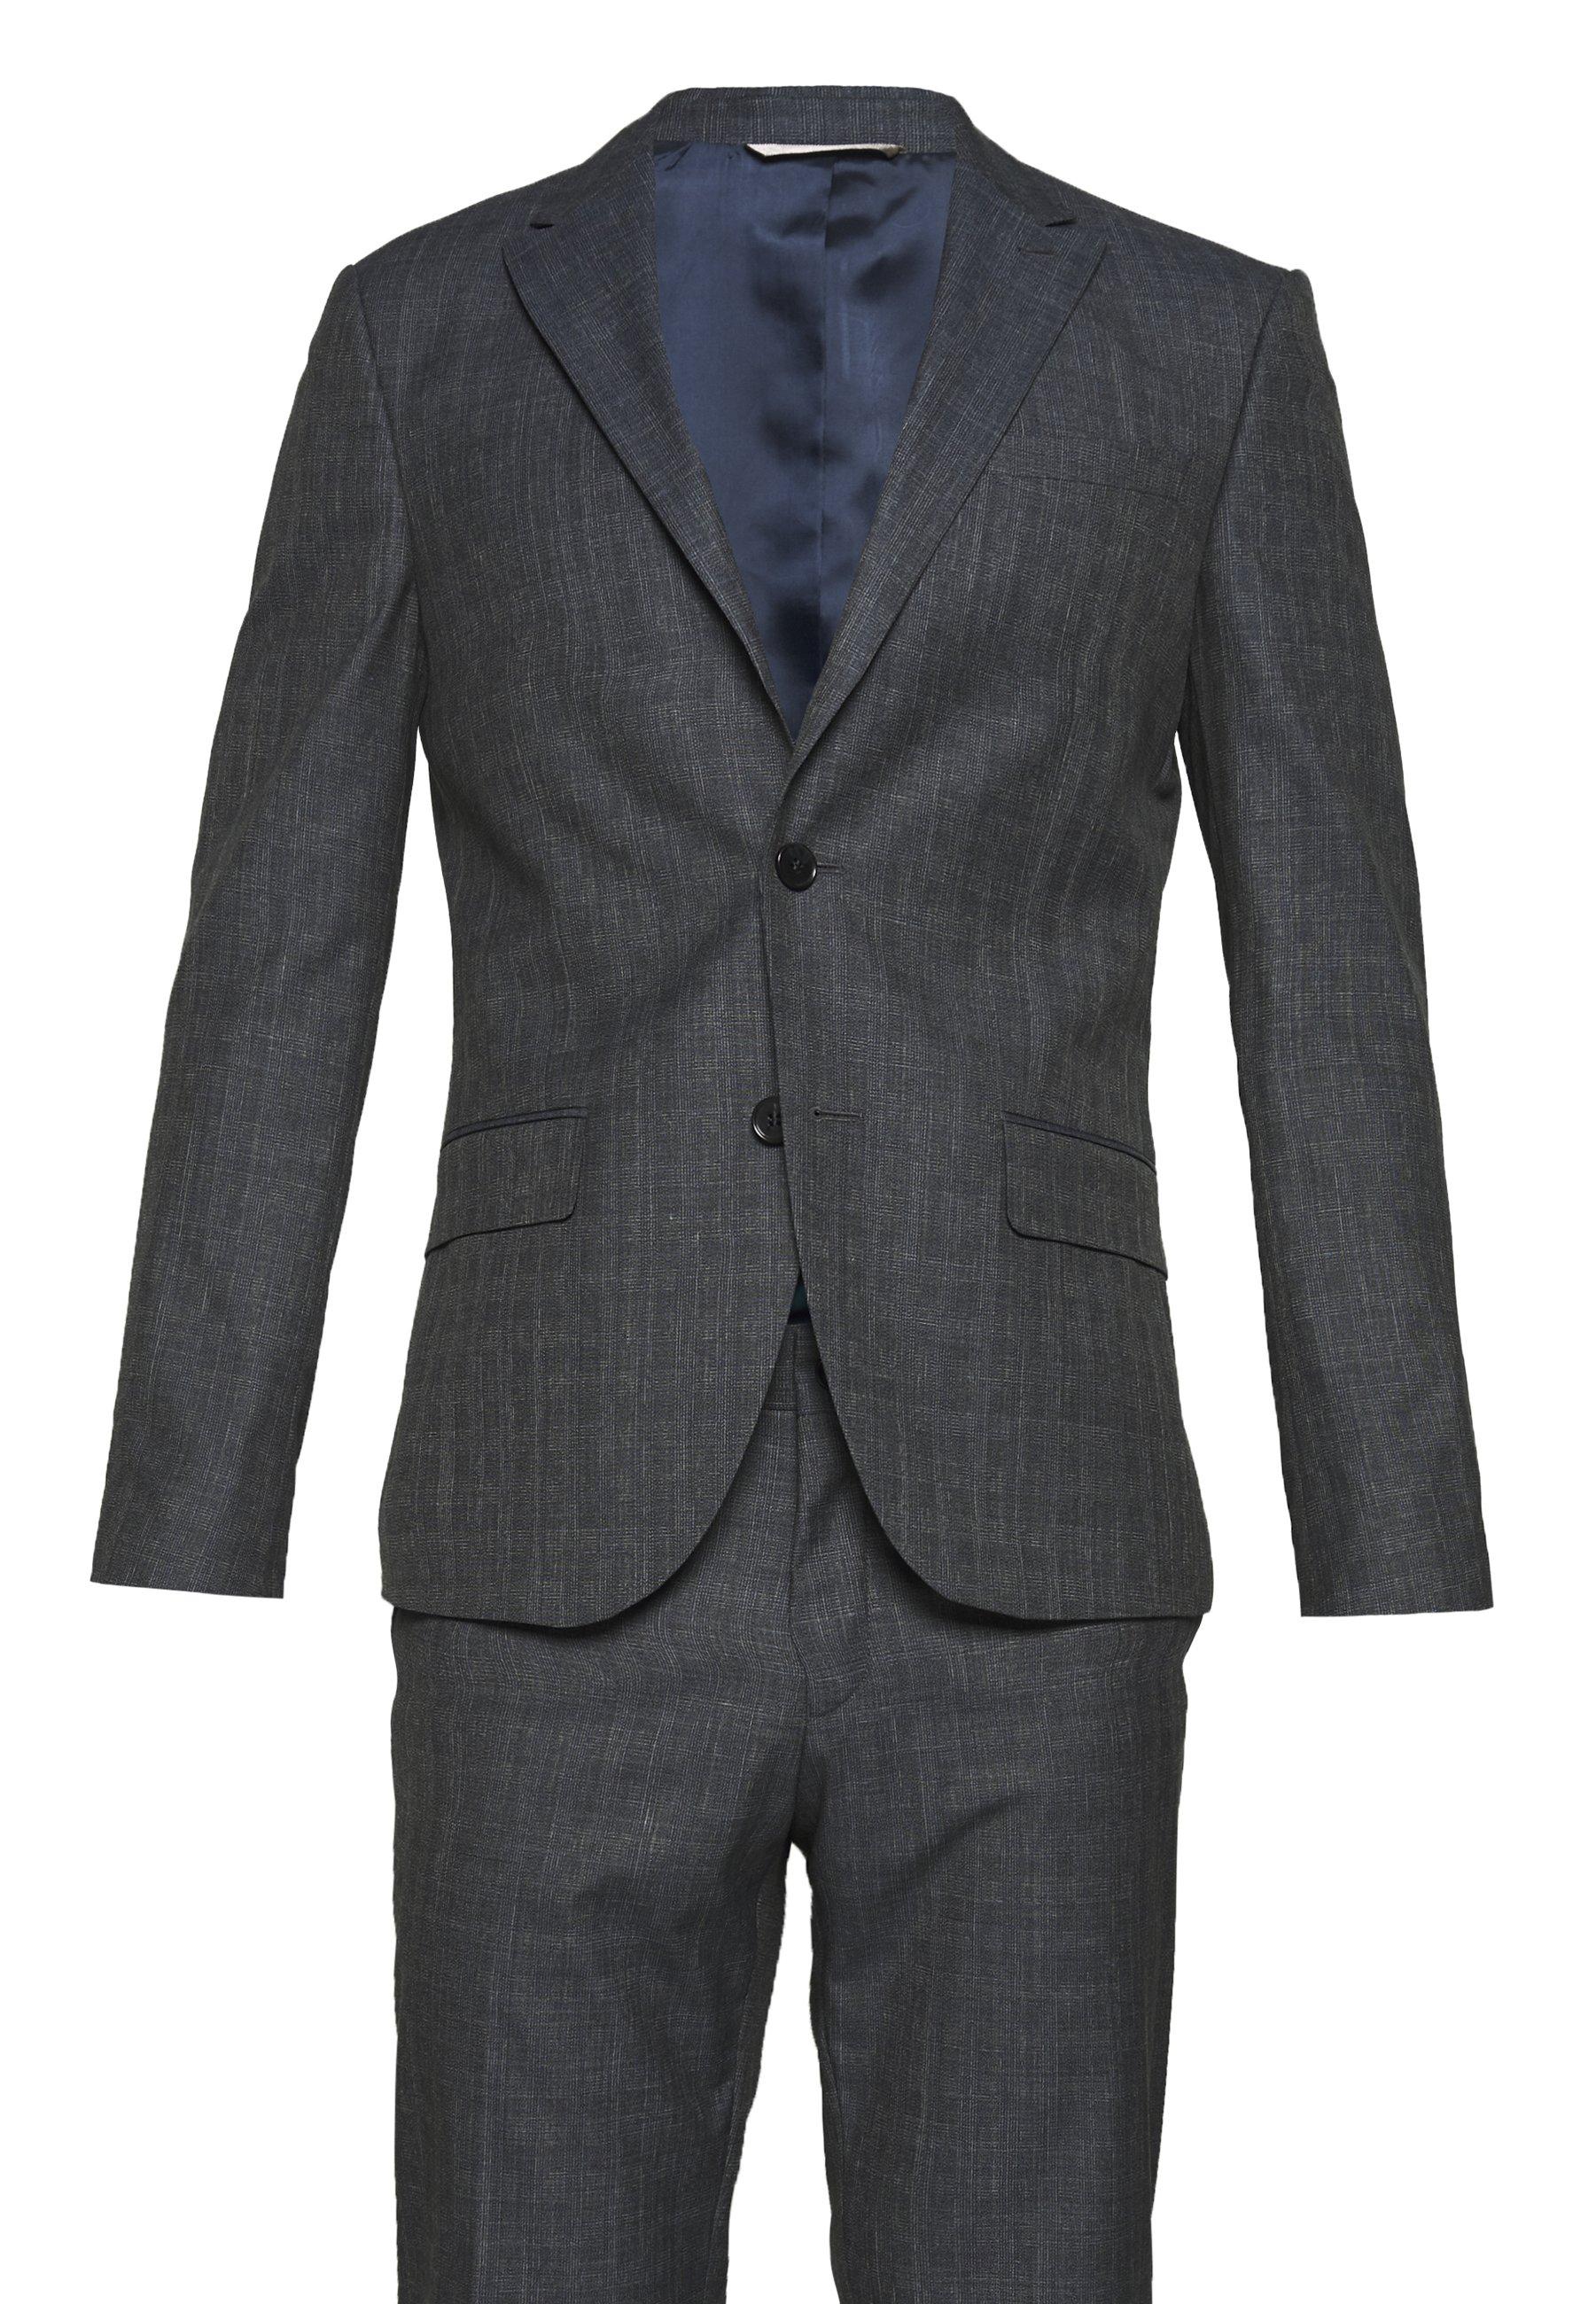 Bertoni Drejer Jepsen Suit - Kostym Dark Blue